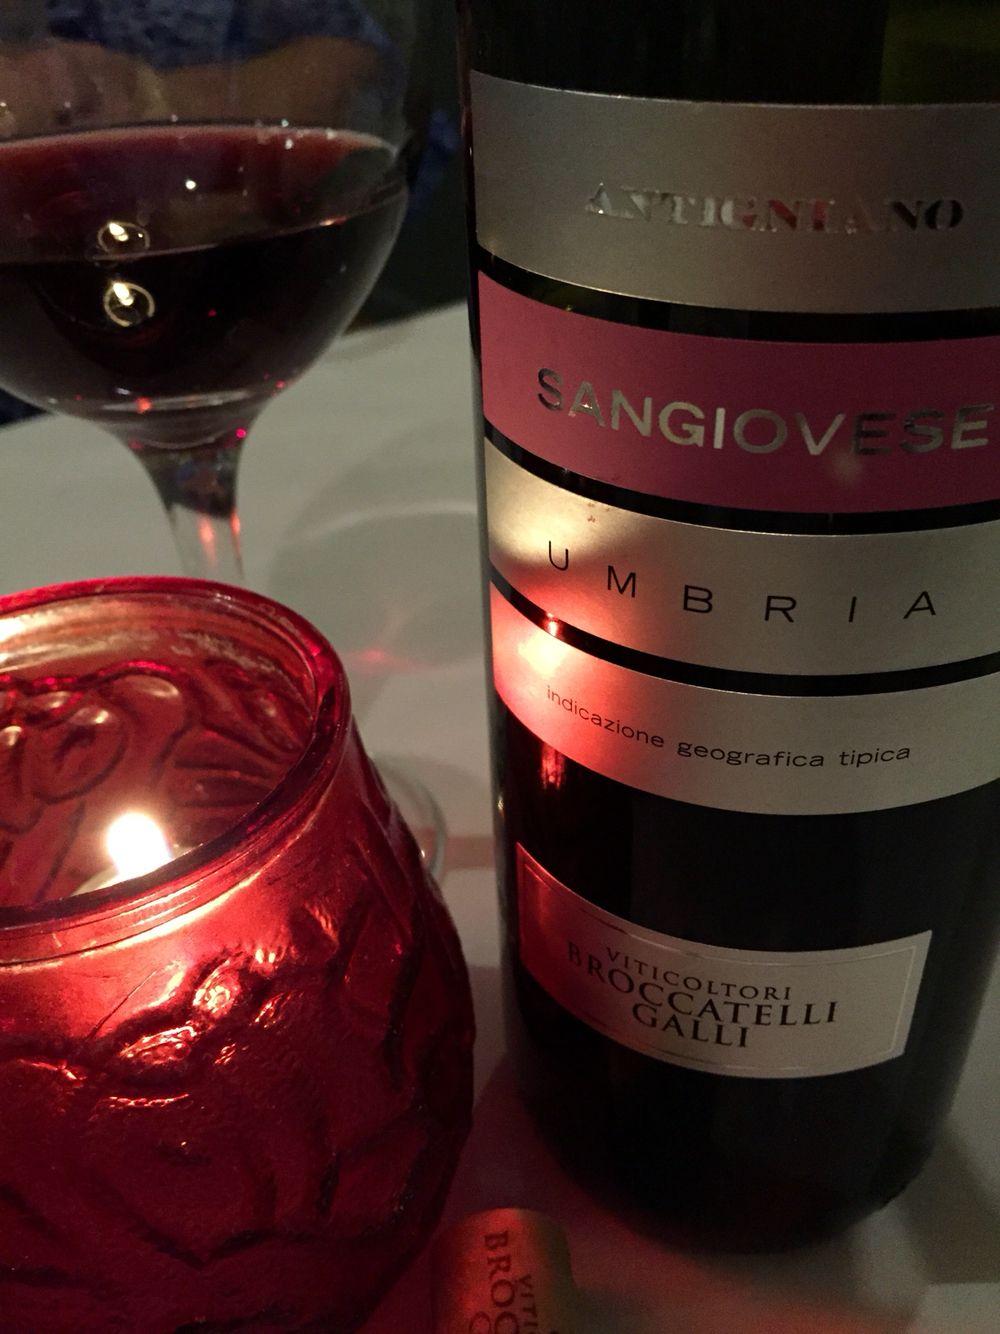 Antigniano Sangiovese Umbria Viticoltori Broccatelli Galli Alcoholic Drinks Food Wine Cellar